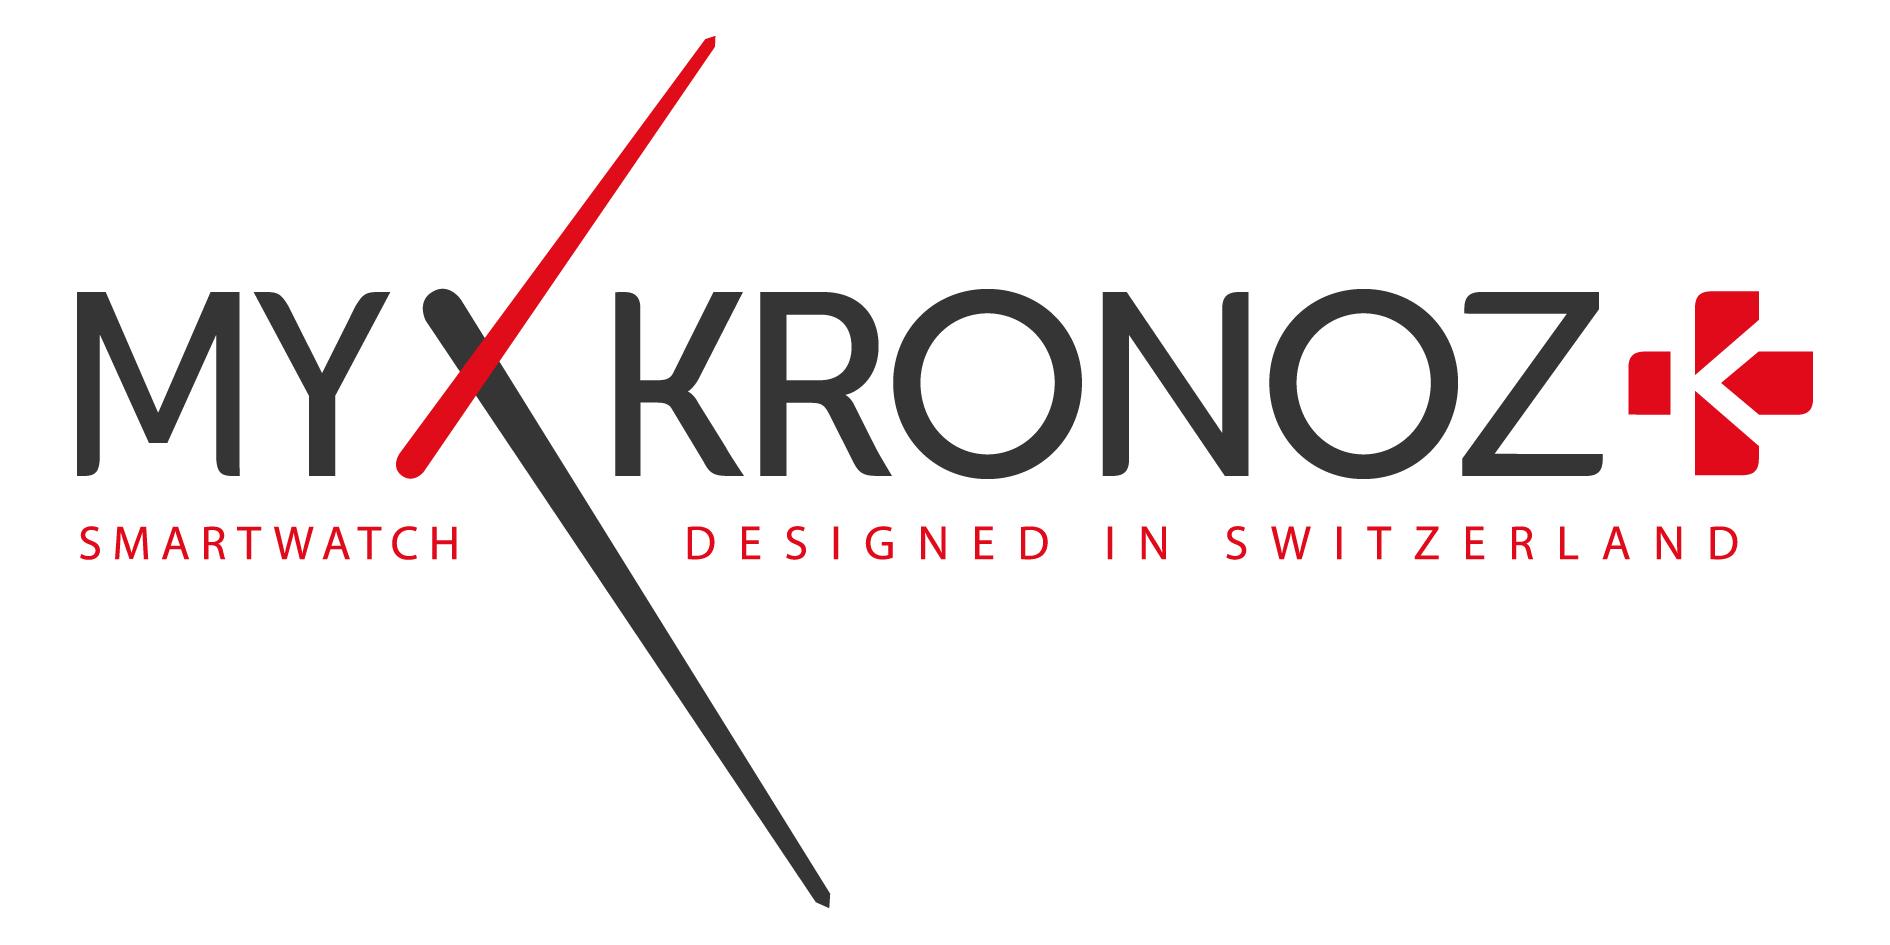 My Kronoz